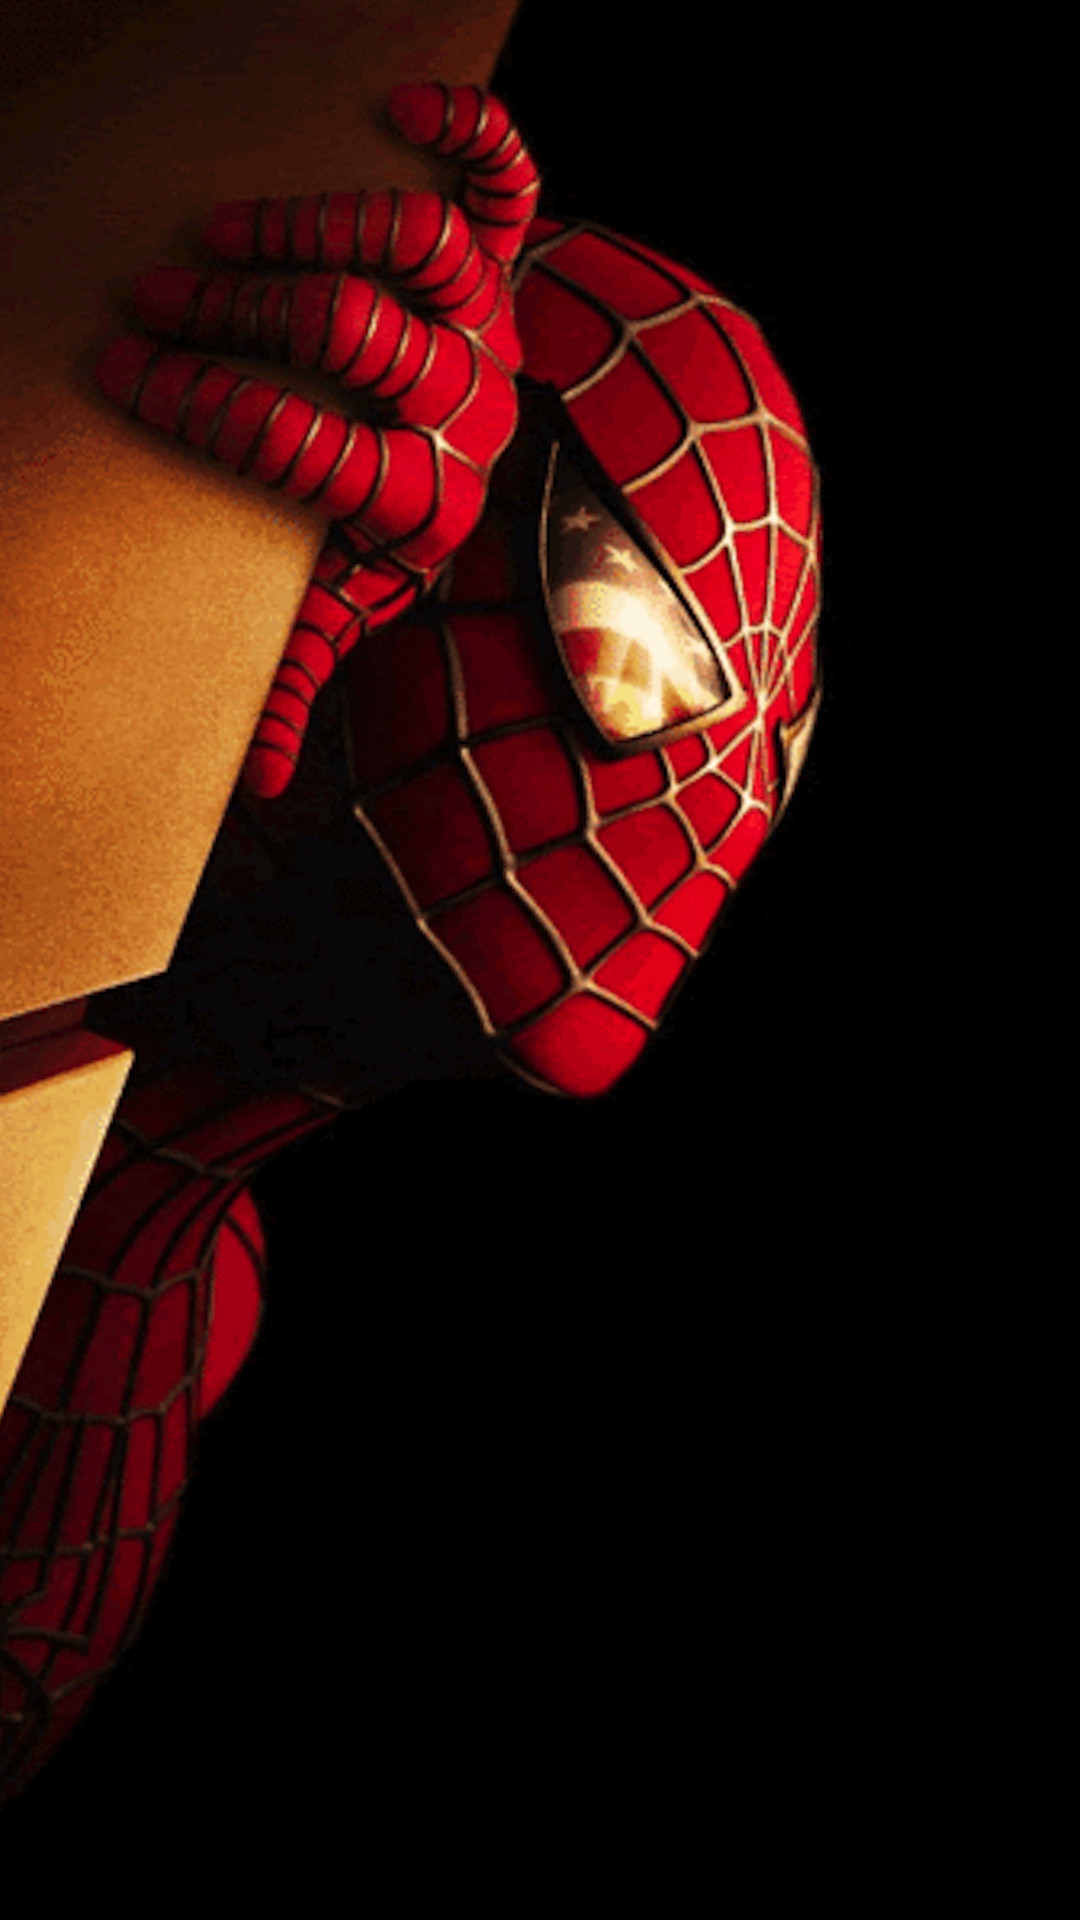 Spider Man Hd Wallpaper For Mobile - Spider Man 4k Wallpaper For Mobile - HD Wallpaper